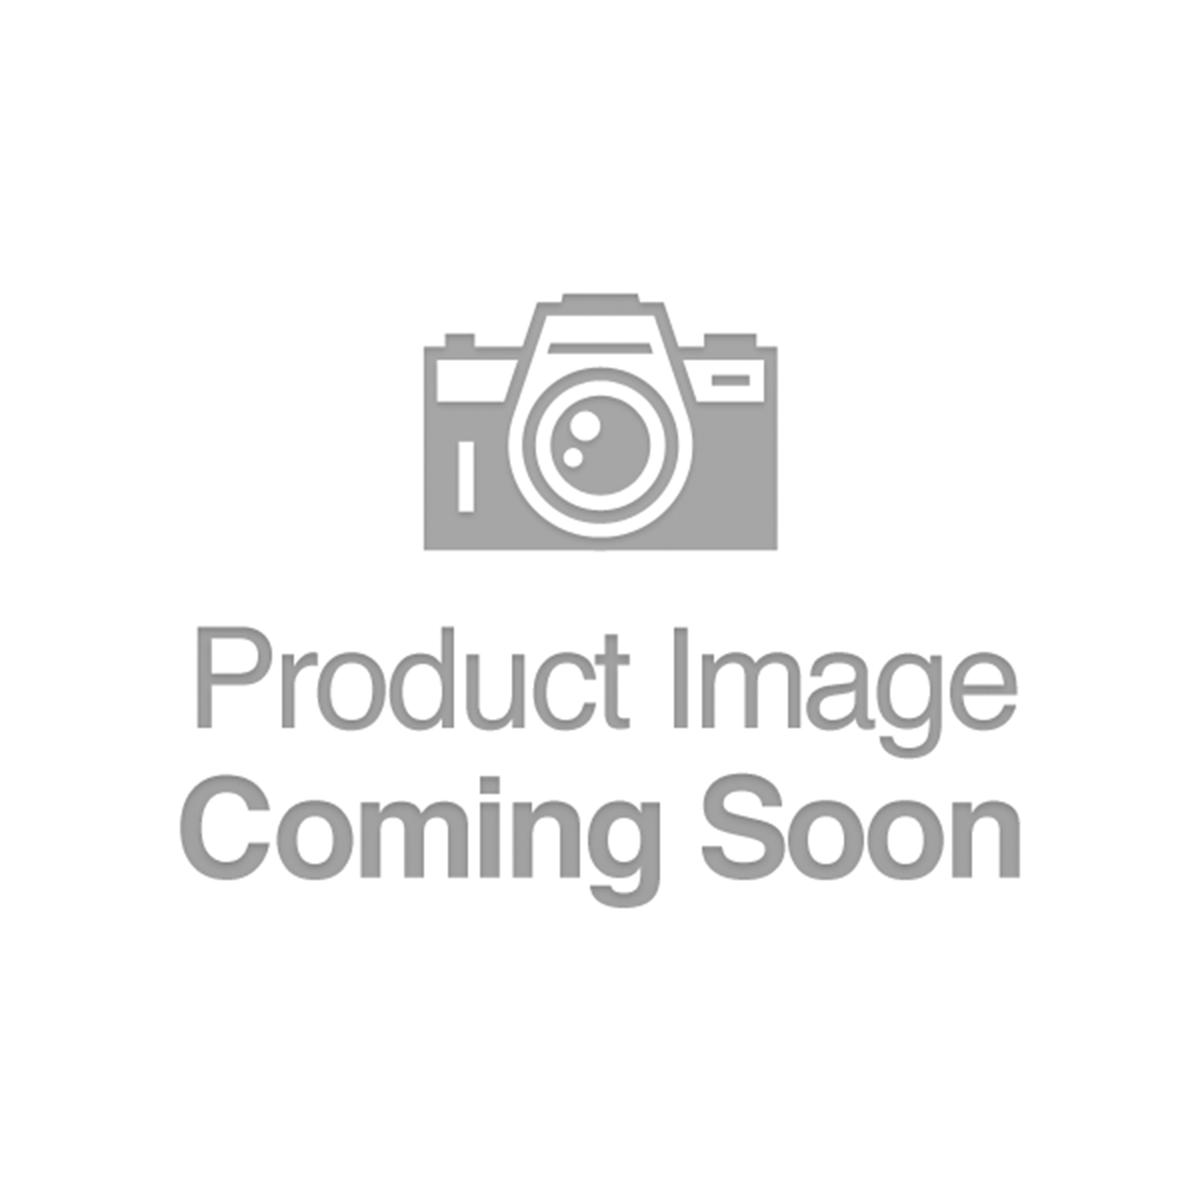 Redwood City - California - CH 7279 - FR 598 - PMG 45